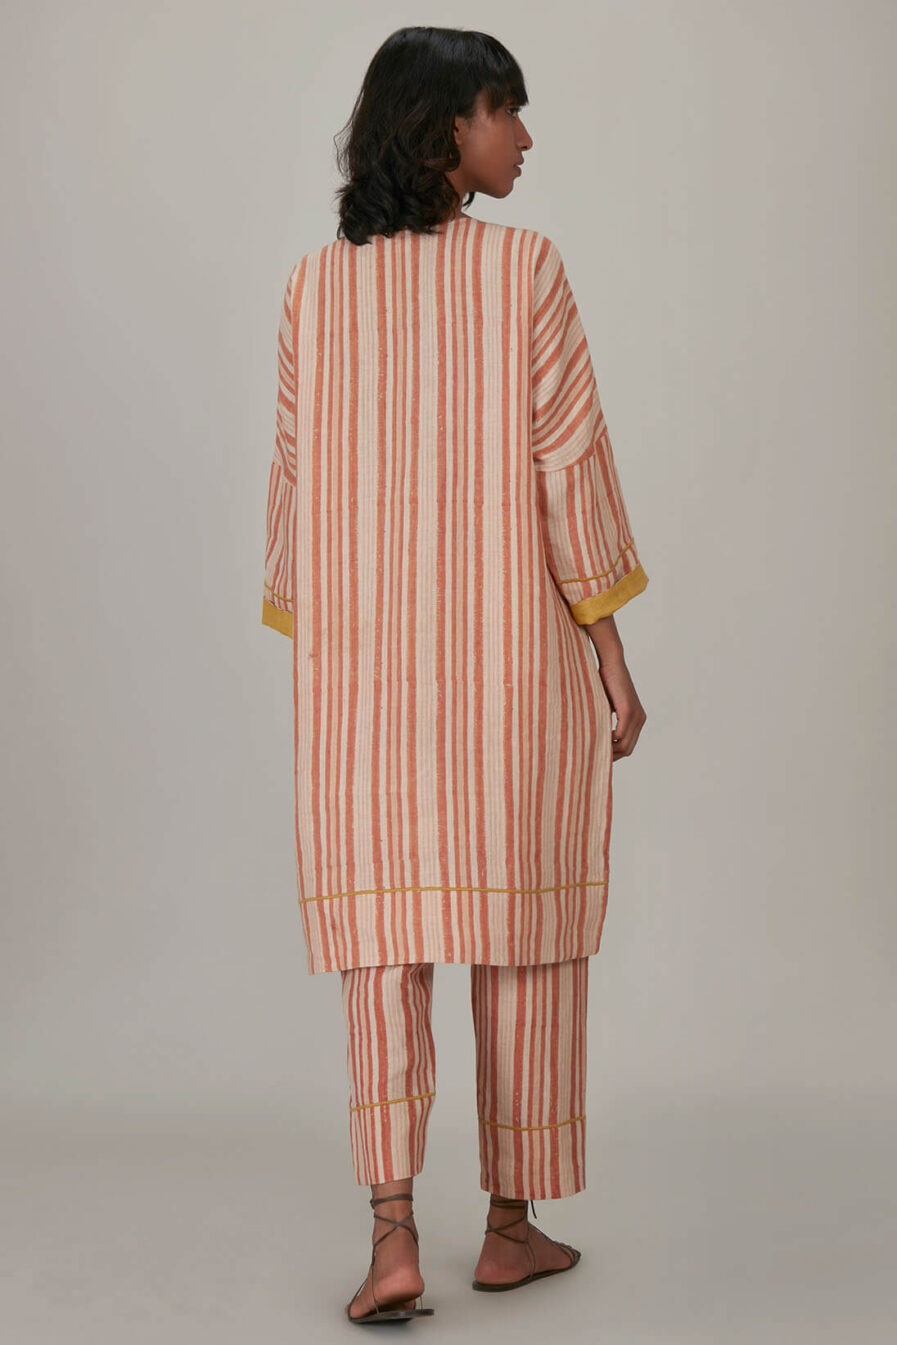 Anavila Peach Block Printed Stripes Organic Linen Tunic